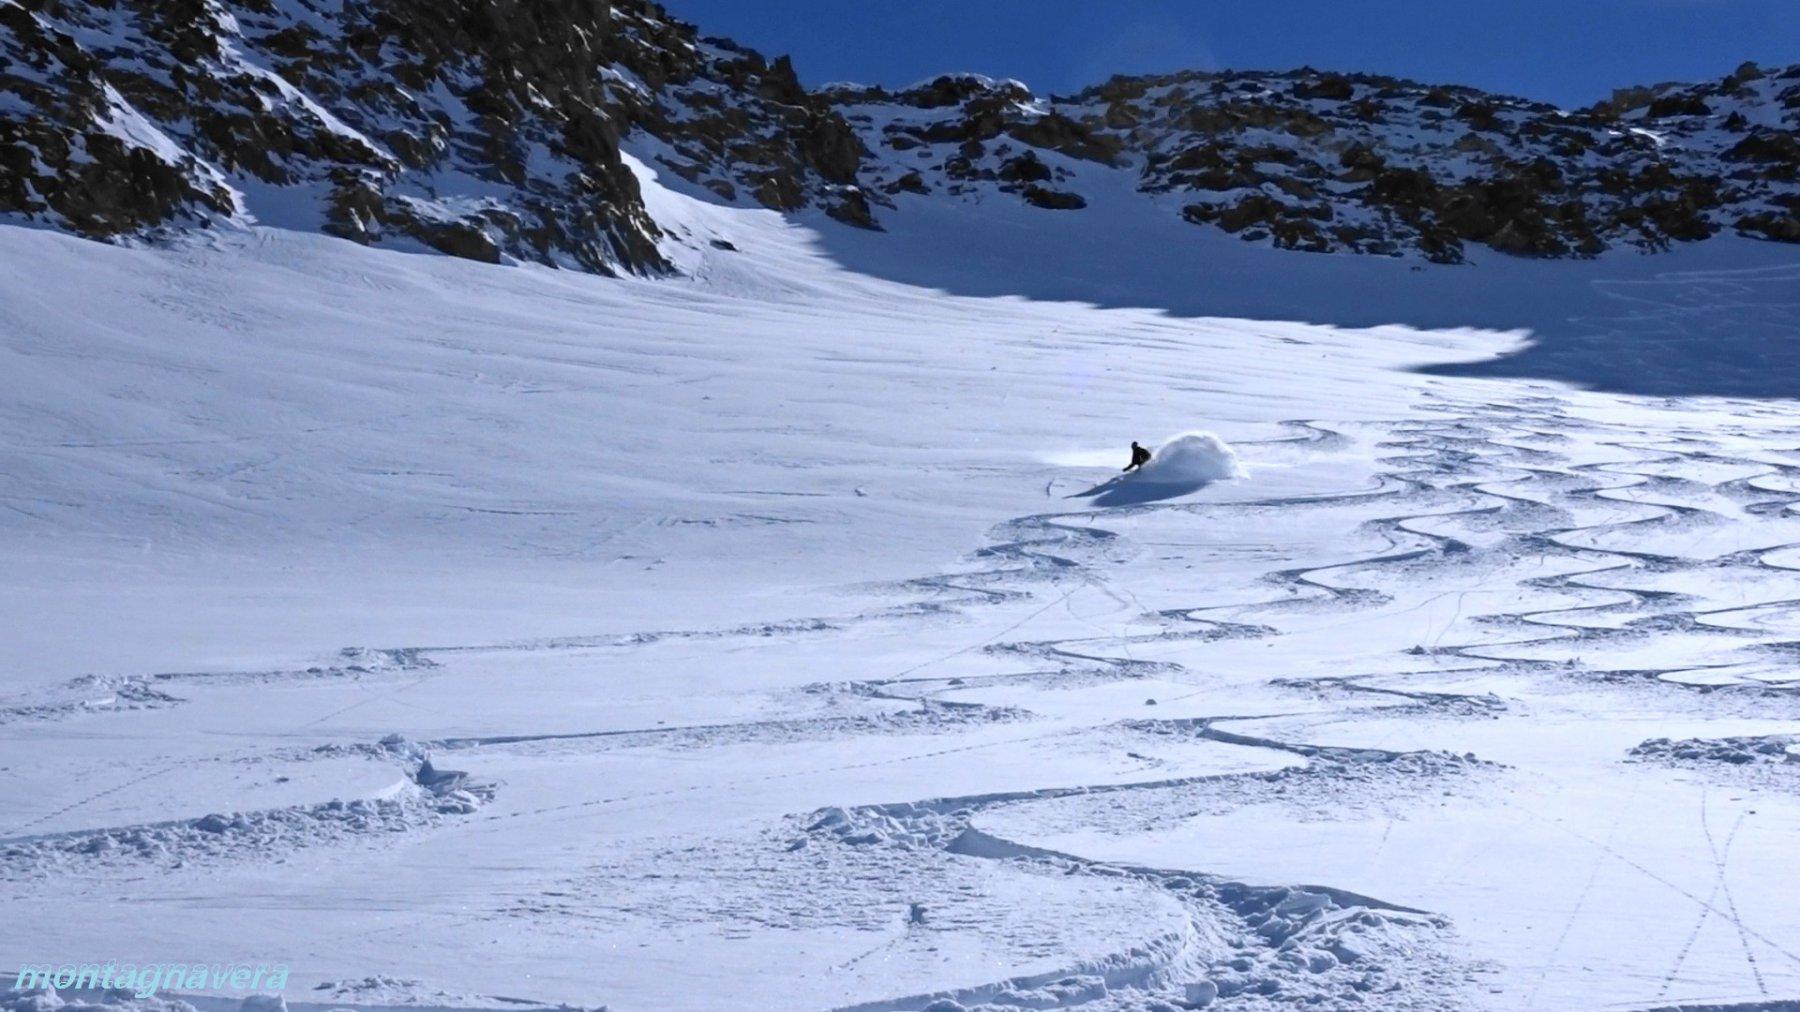 fotogramma da video sul ghiacciaio 2900-3000m